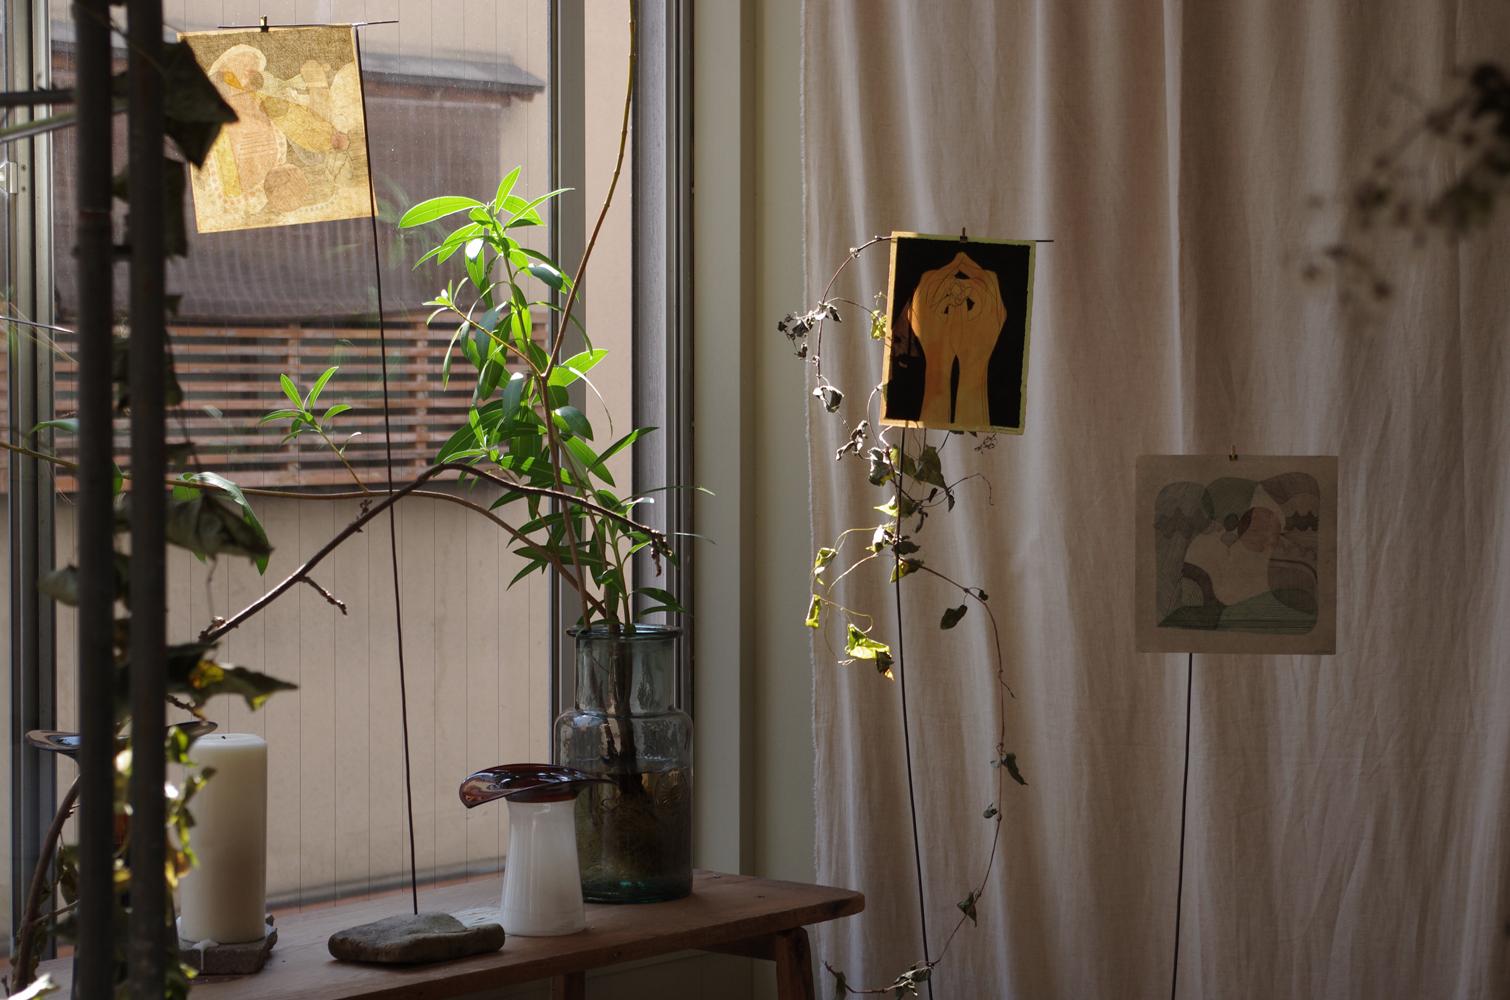 Fujikawa atelier 4-14